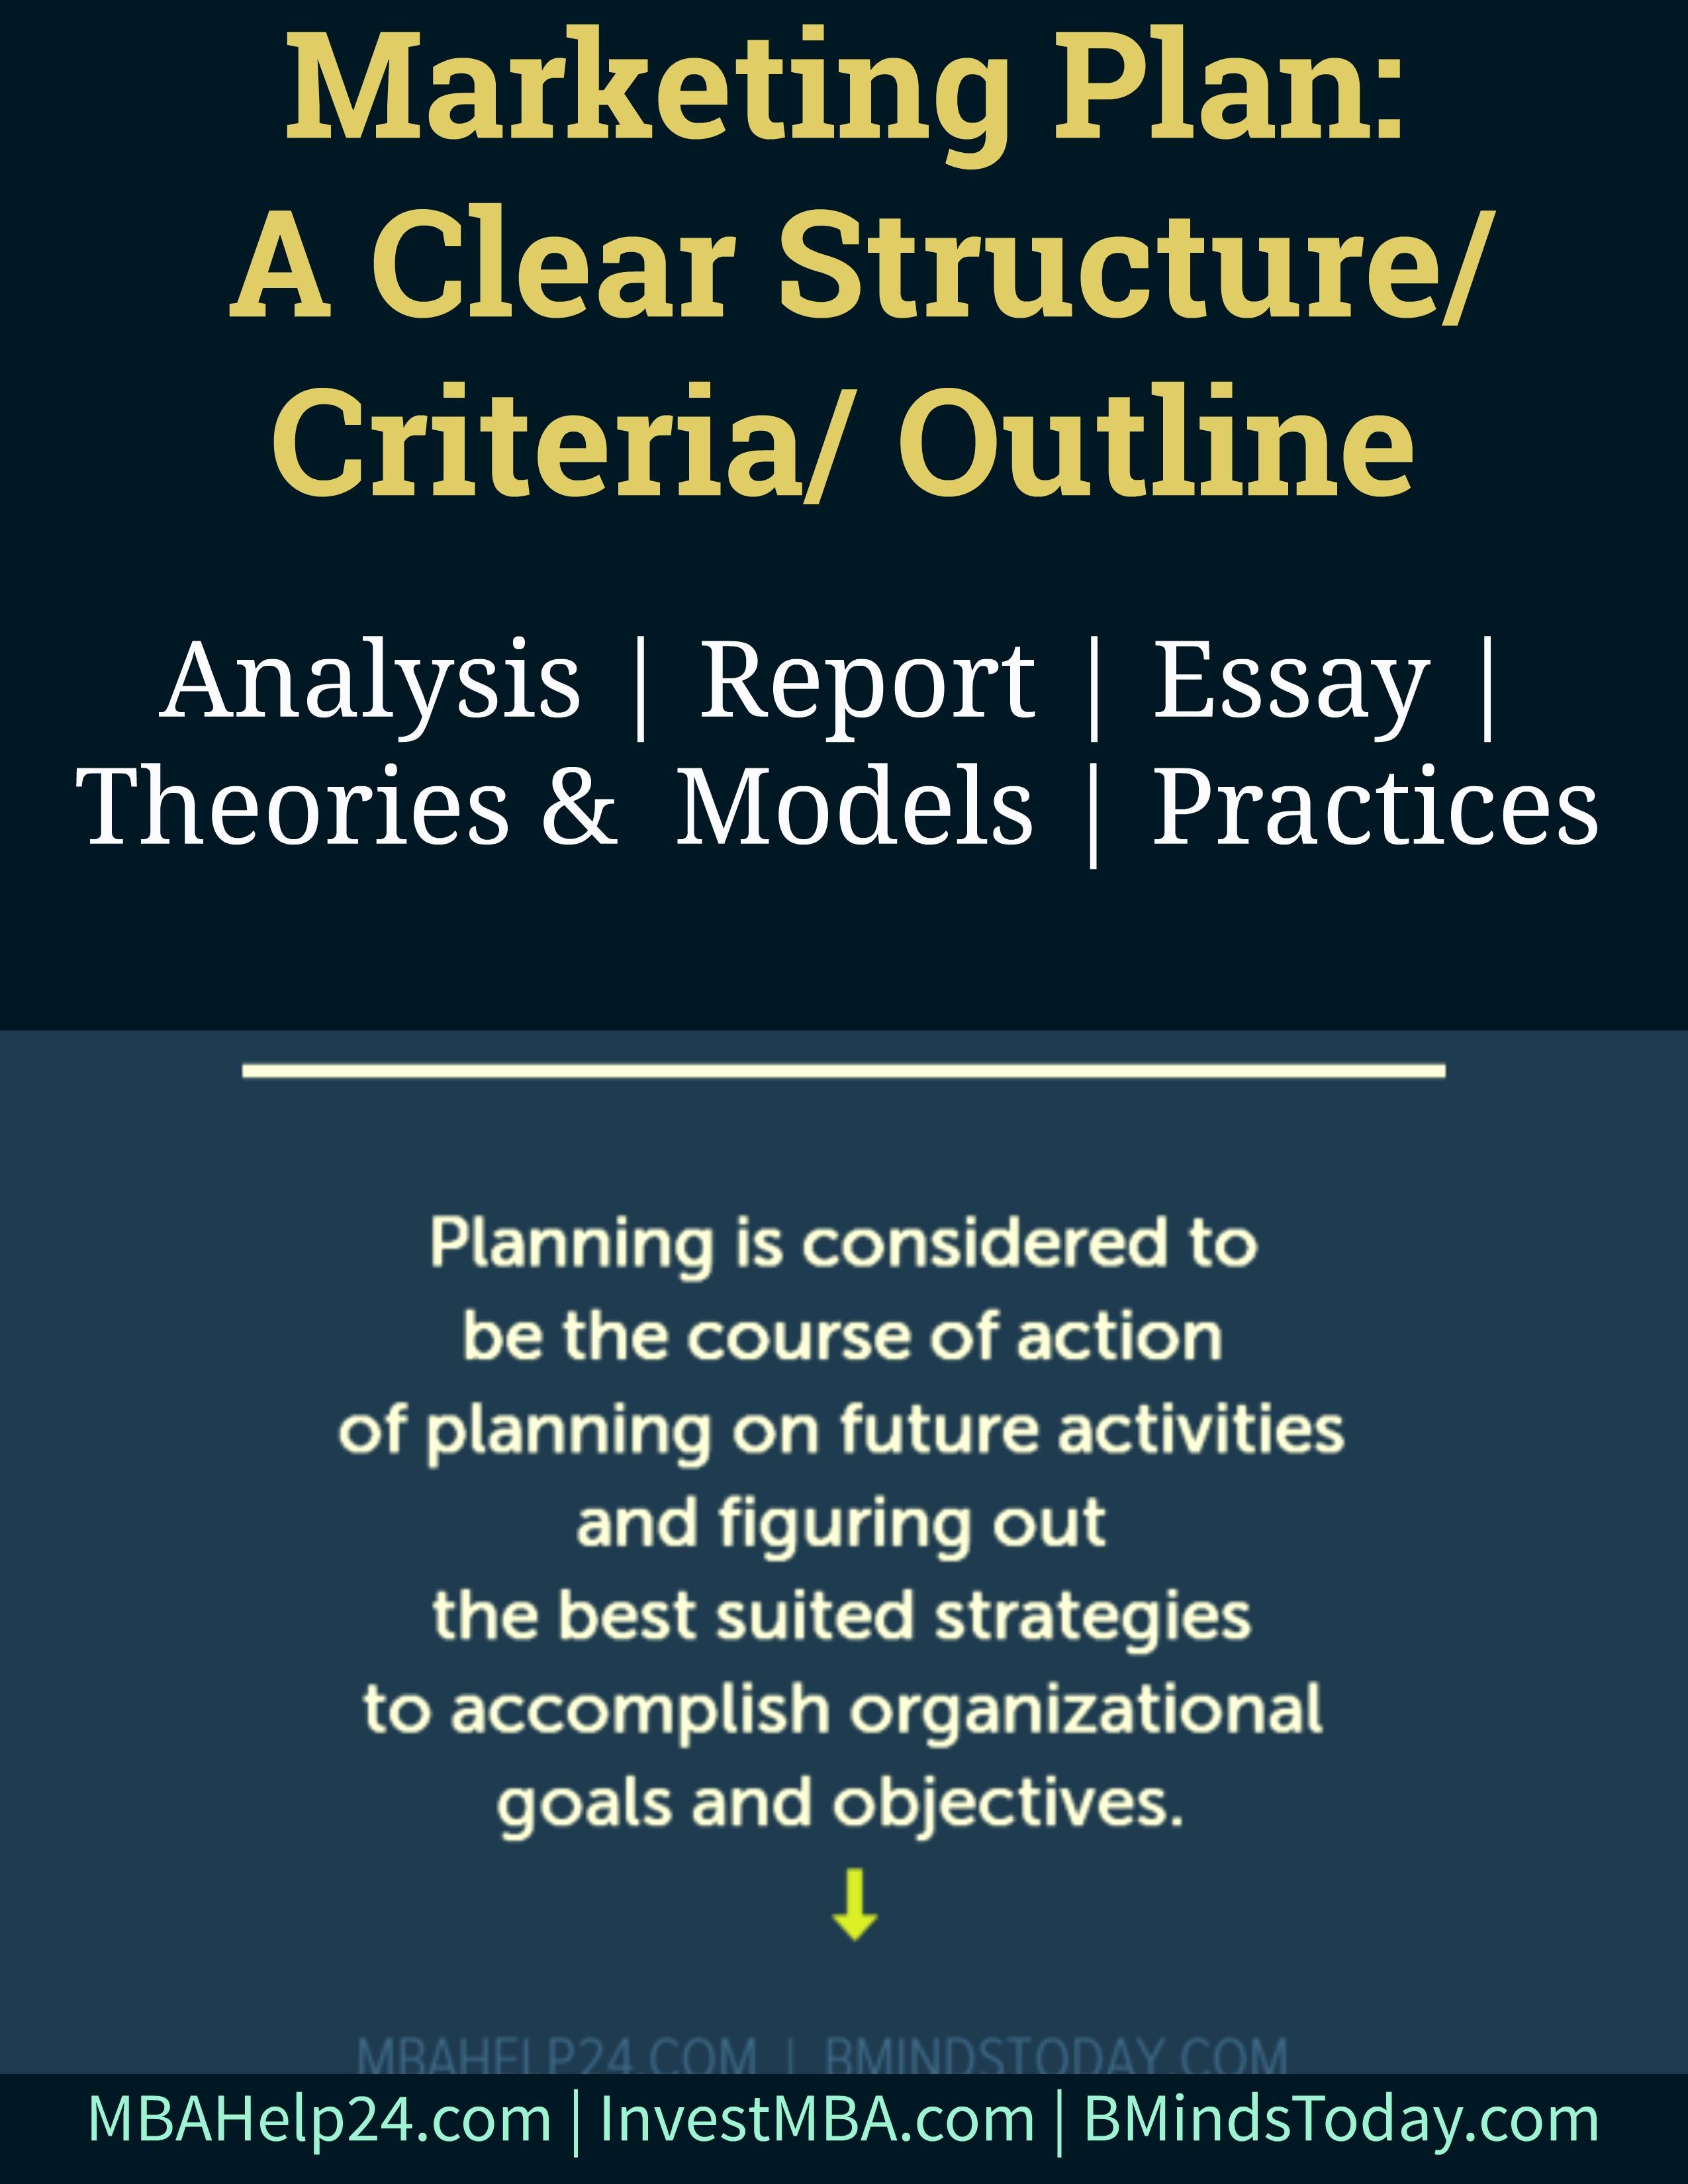 Marketing Plan | A Clear Structure | Criteria | Outline marketing plan Marketing Plan: A Clear Structure/ Criteria/ Outline Marketing Plan A Clear Structure Criteria Outline